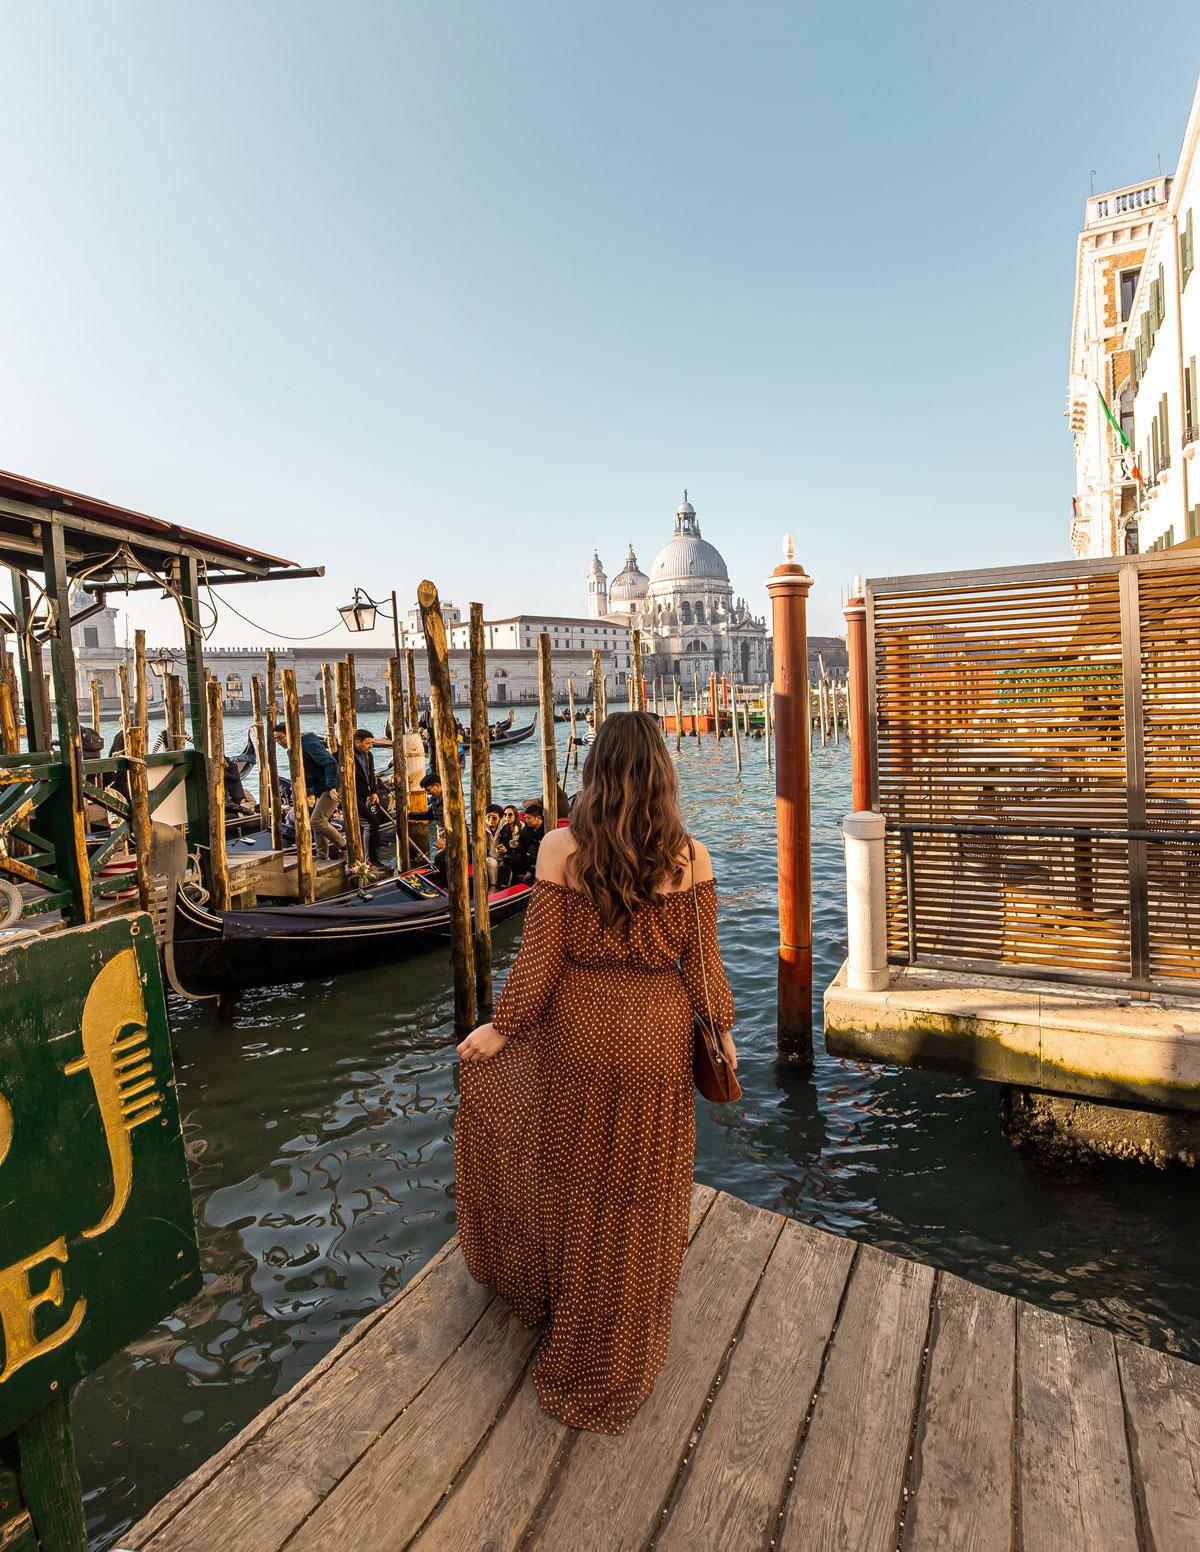 30-top-things-to-do-in-Venice---Venice-Instagram-spots-–-Venice-bucket-list---kelseyinlondon---kelsey-heinrichs---venice-gondola-ride---venice-grand-canal